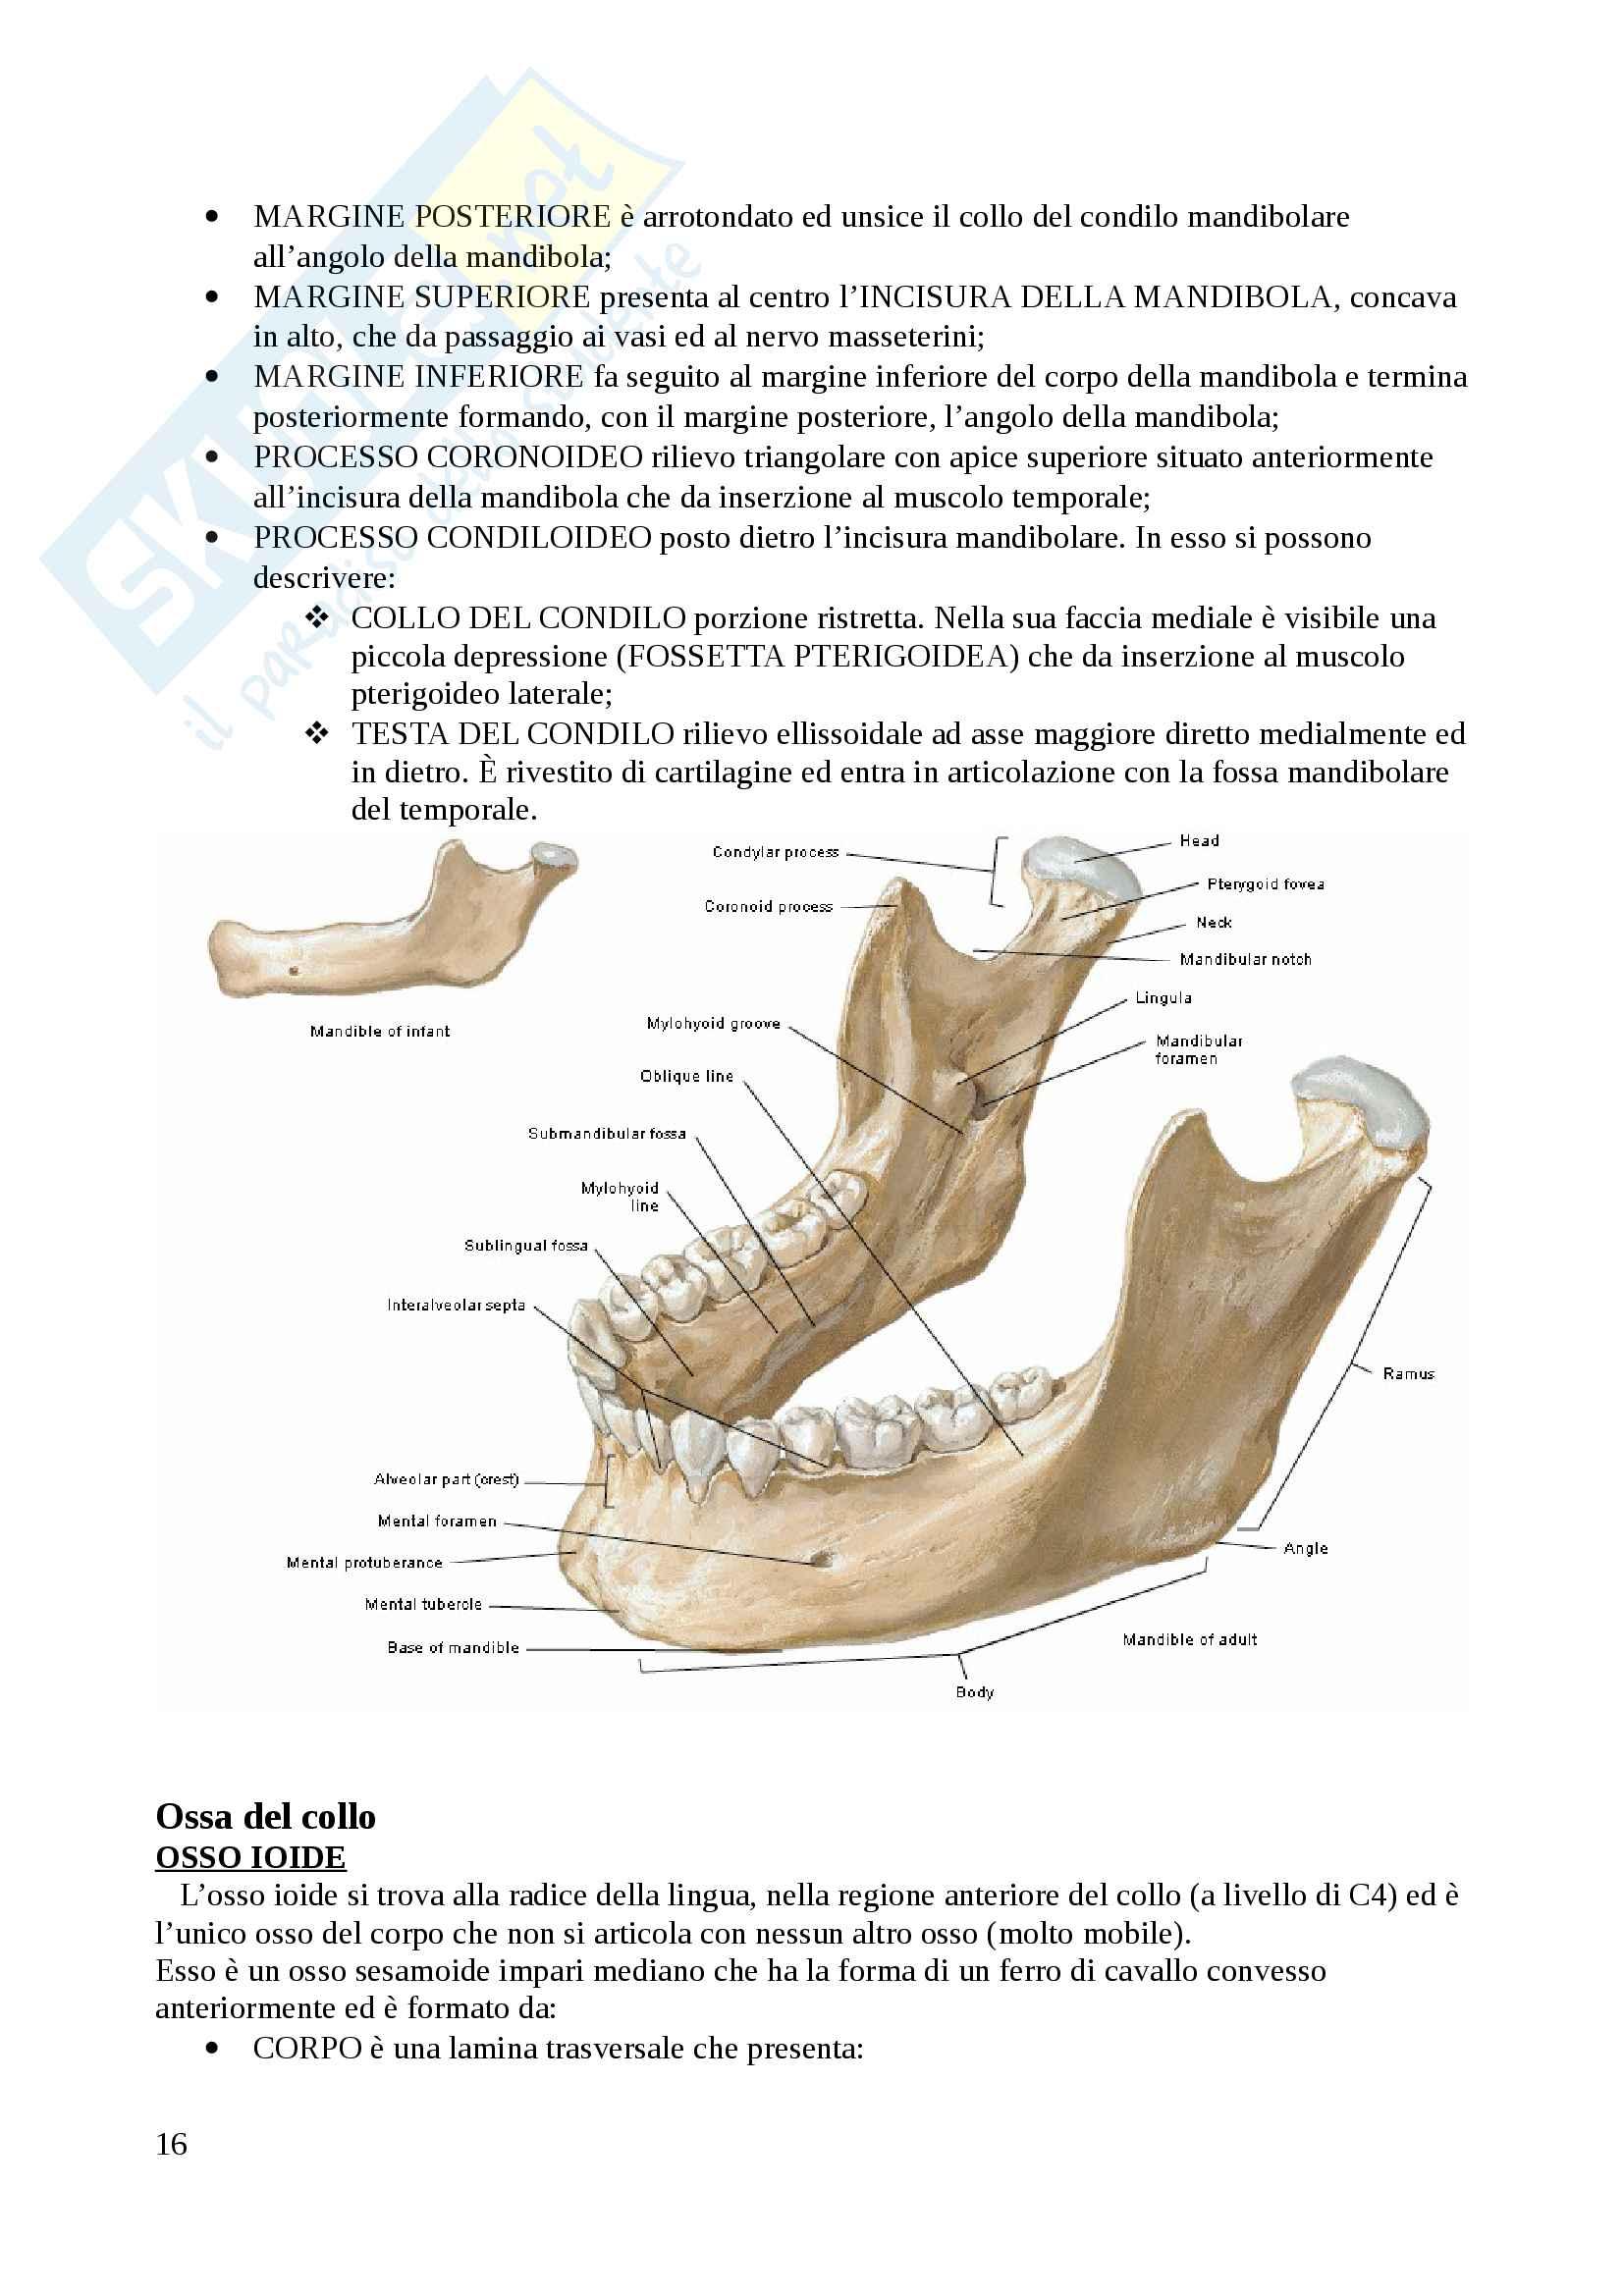 Apparato scheletrico Pag. 16